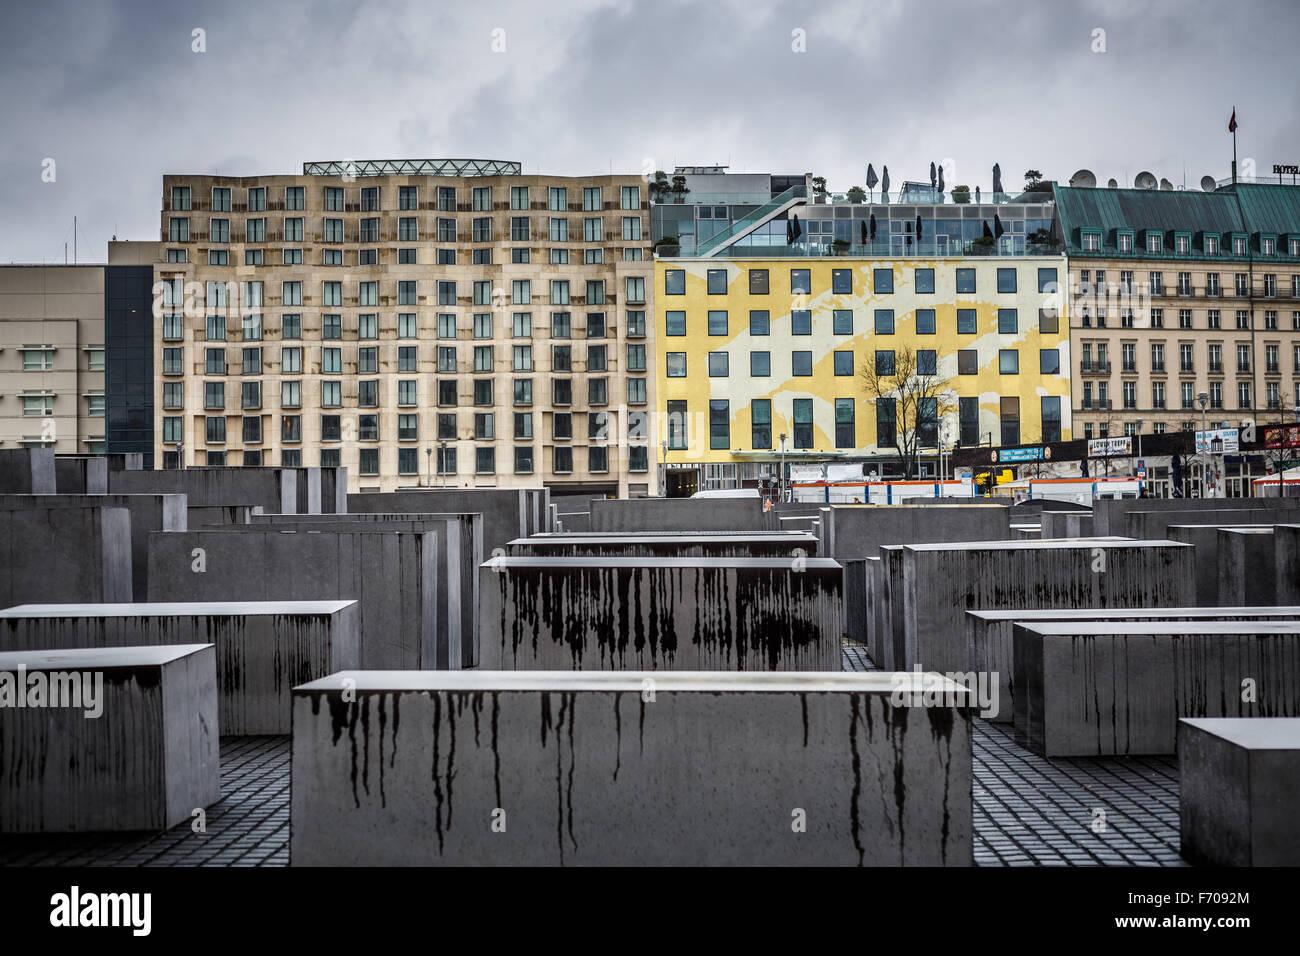 Holocaust-Mahnmal in Berlin, Germany - Stock Image